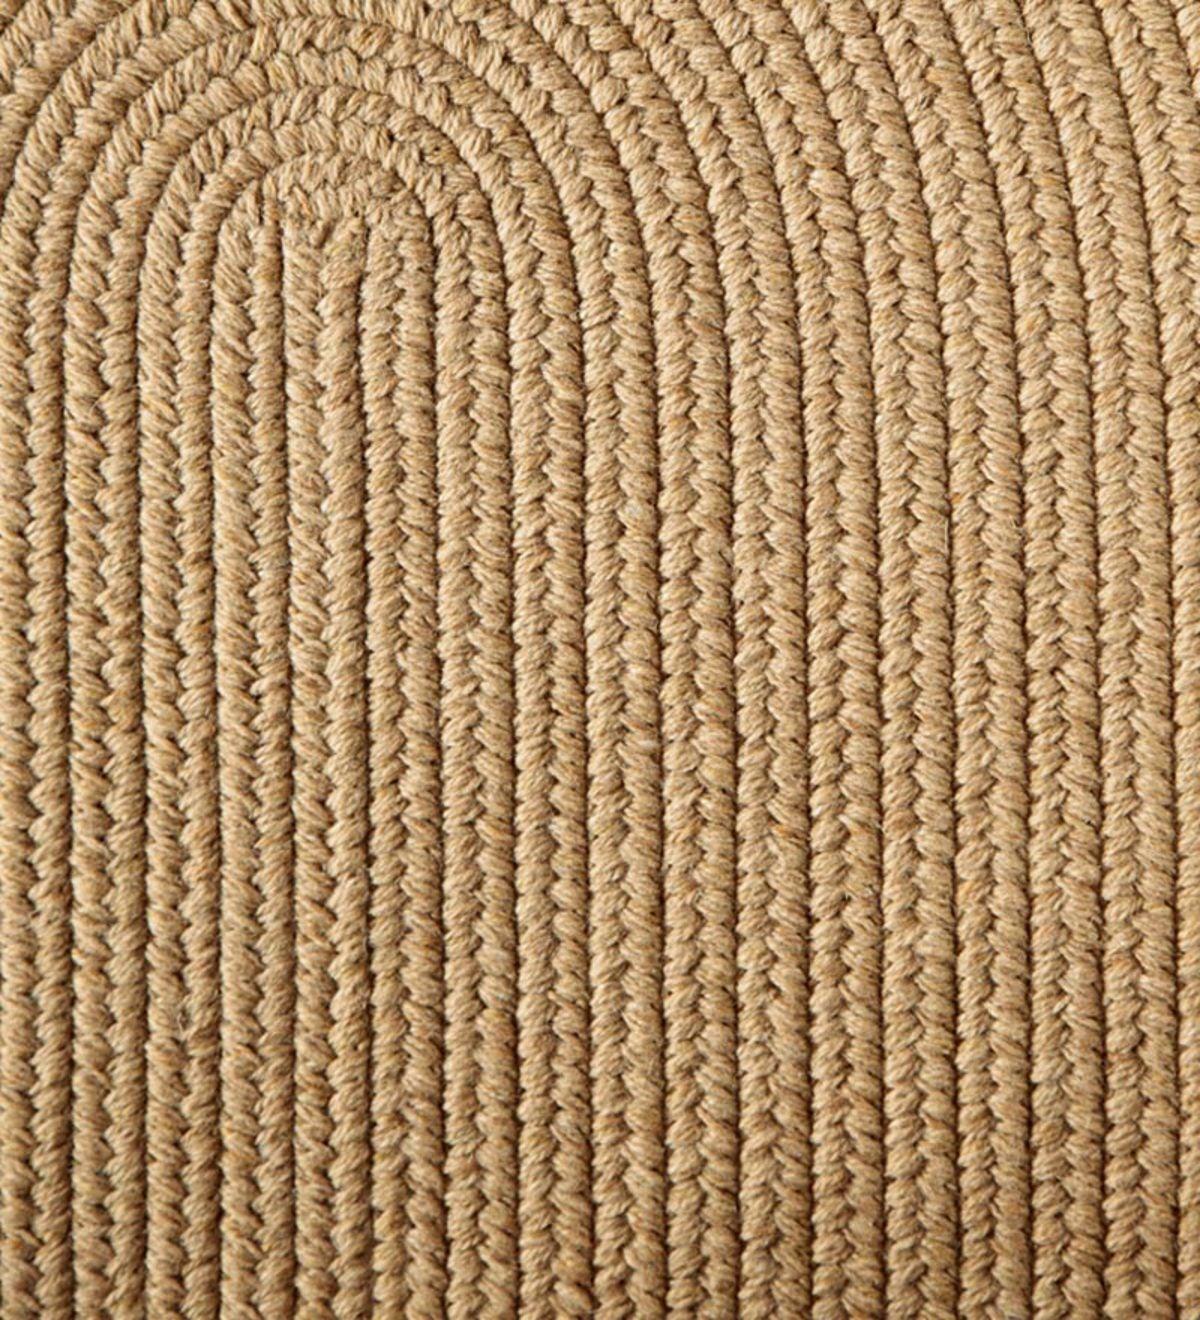 Blue Ridge Wool Oval Braided Rug, 8' X 11'